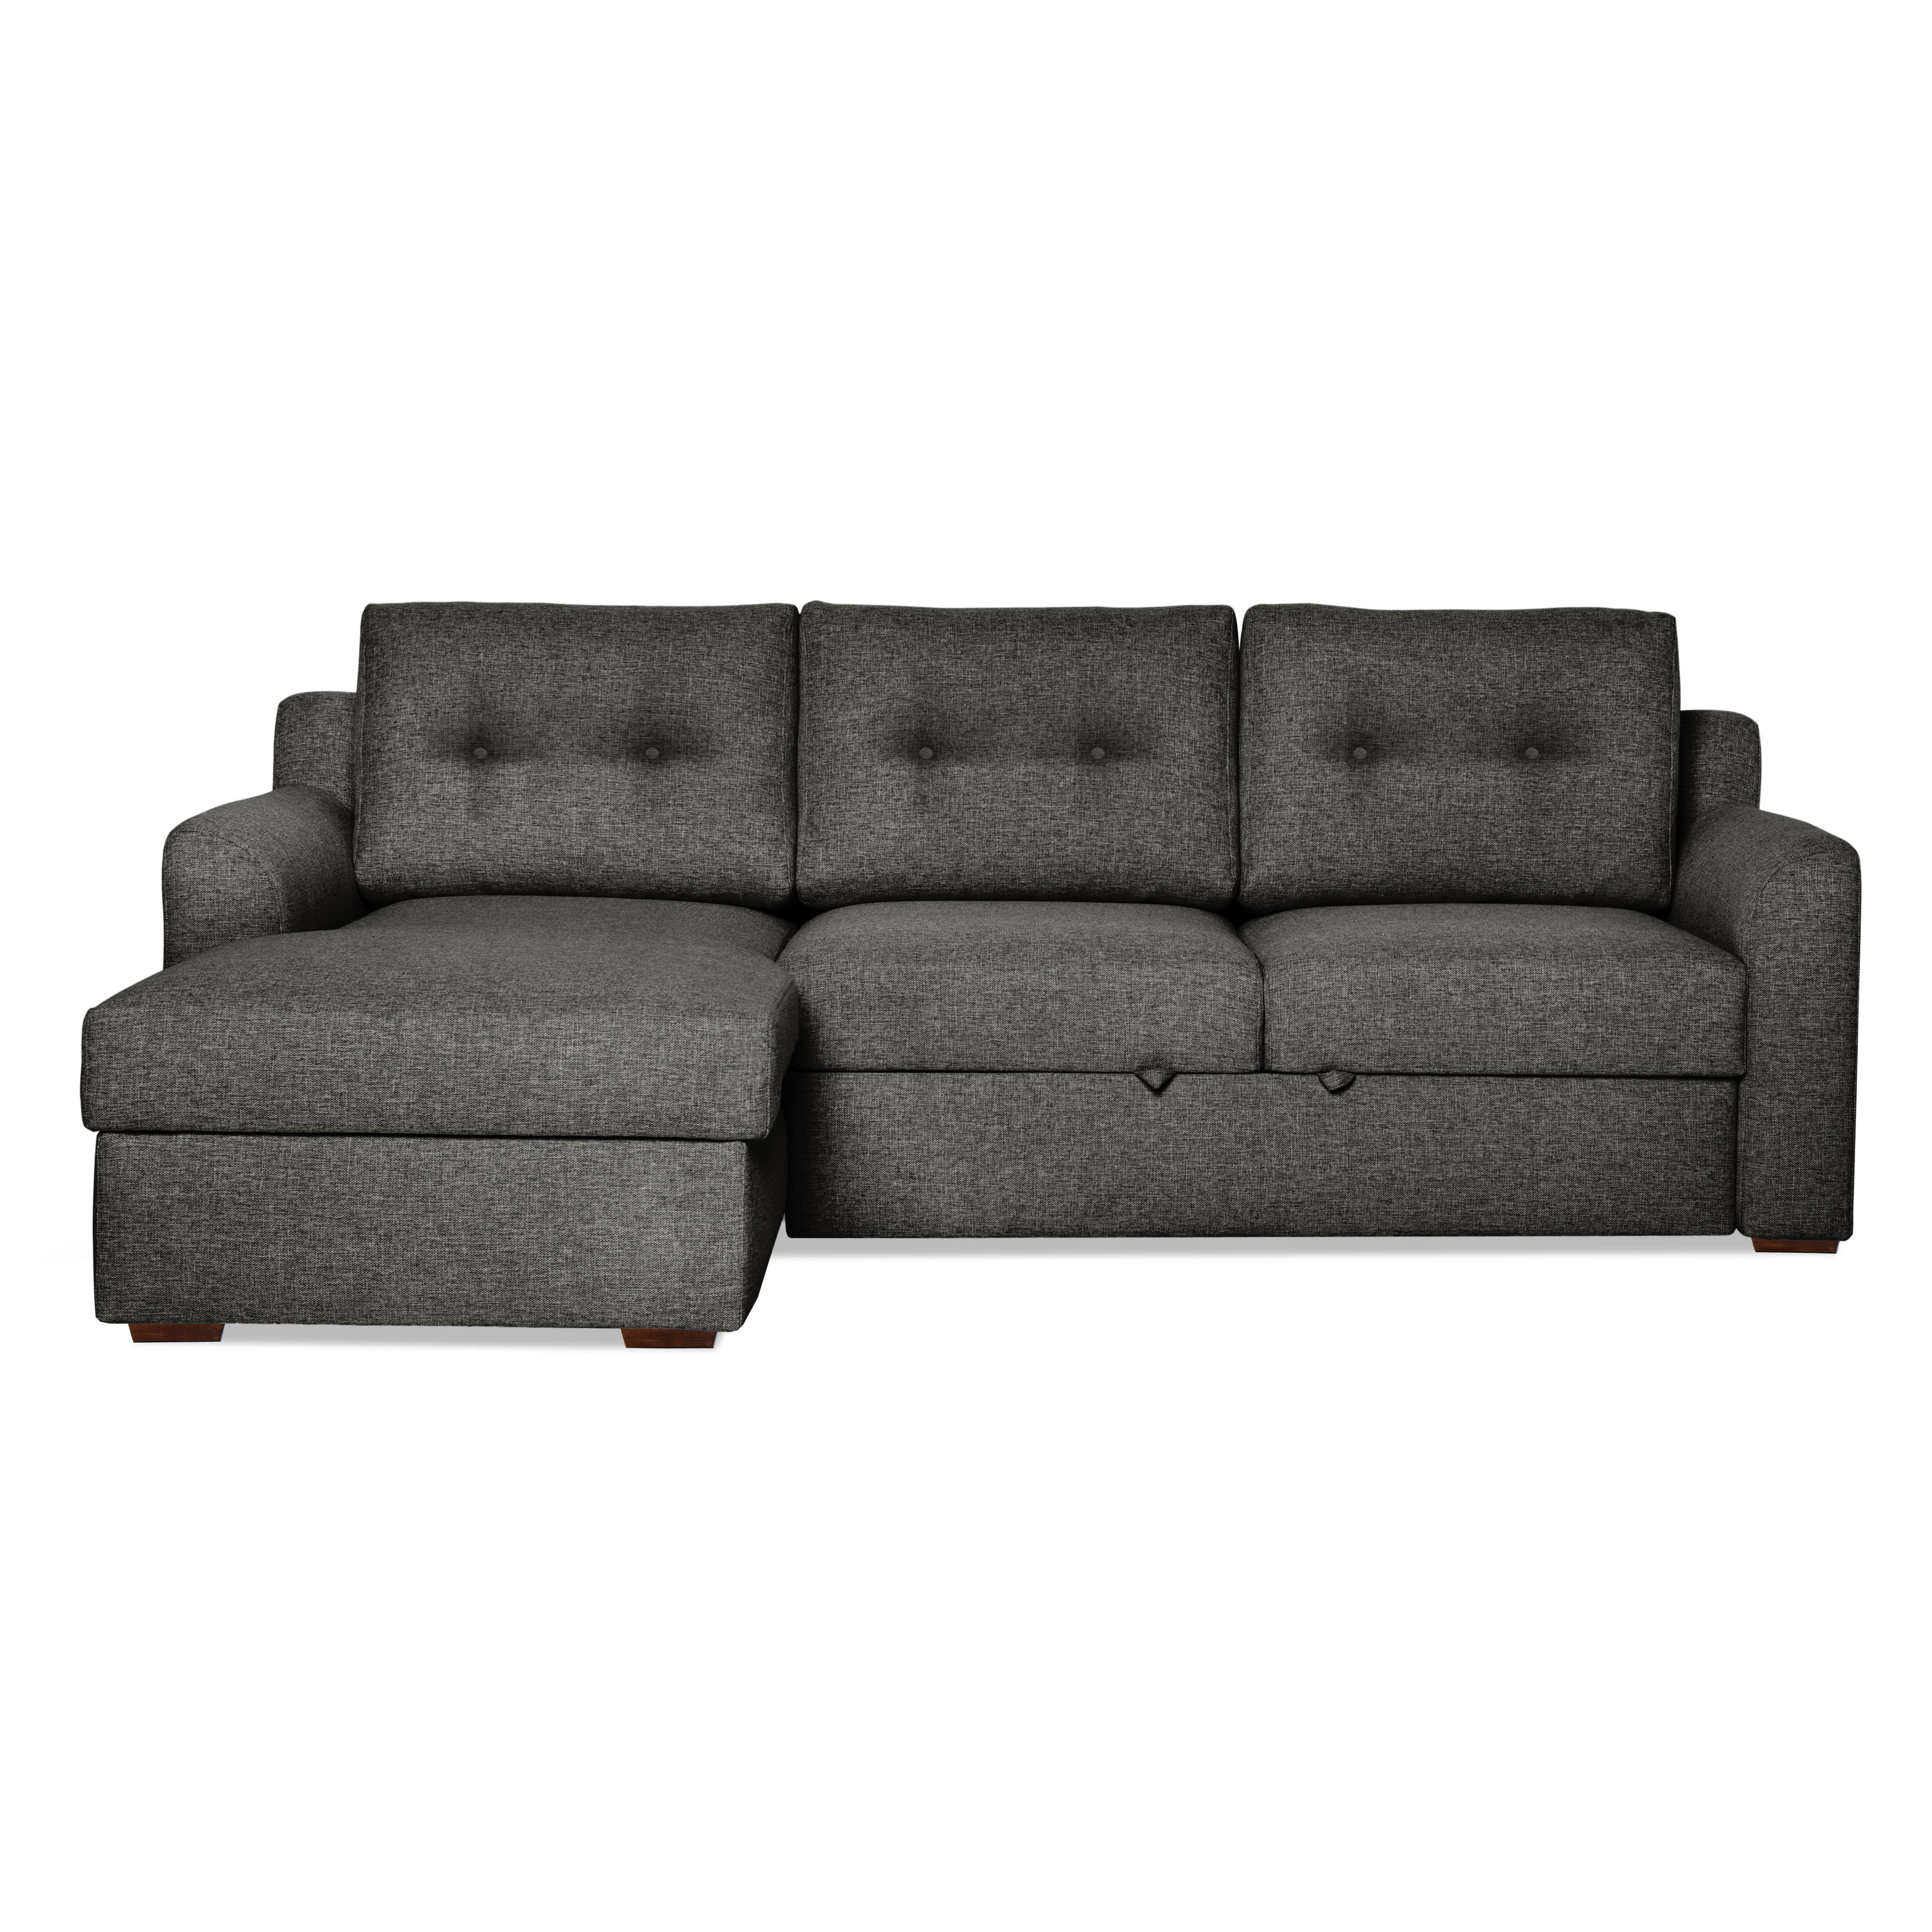 Jermaine Corner Sofa Sofa Corner Sofa Chaise Sofa